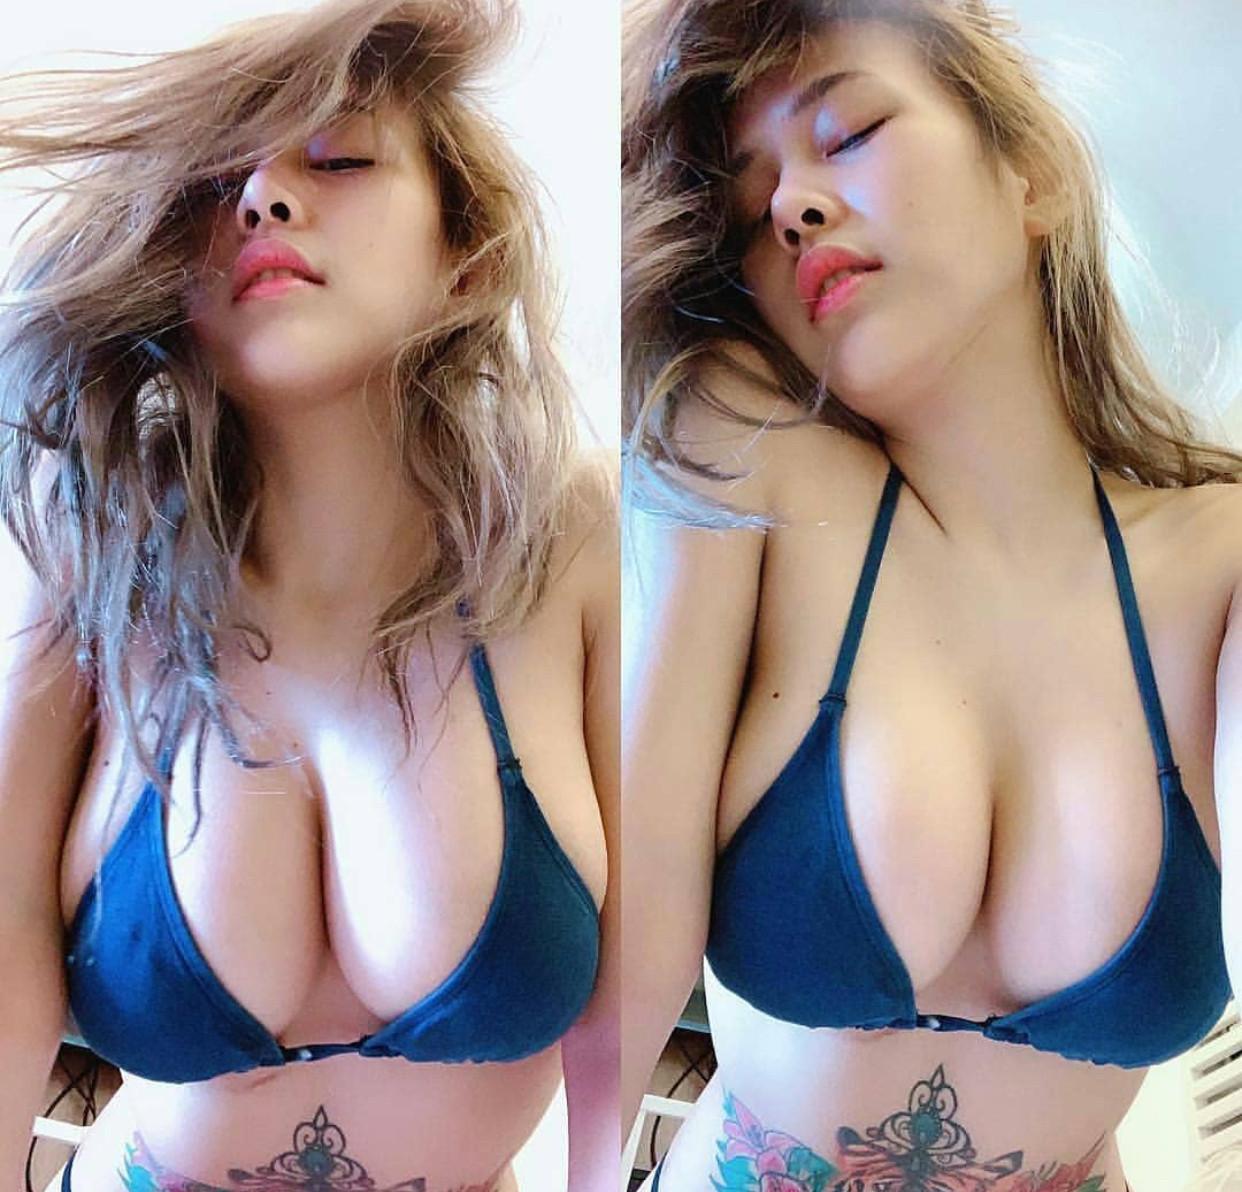 Body Art Porn Photo Eporner